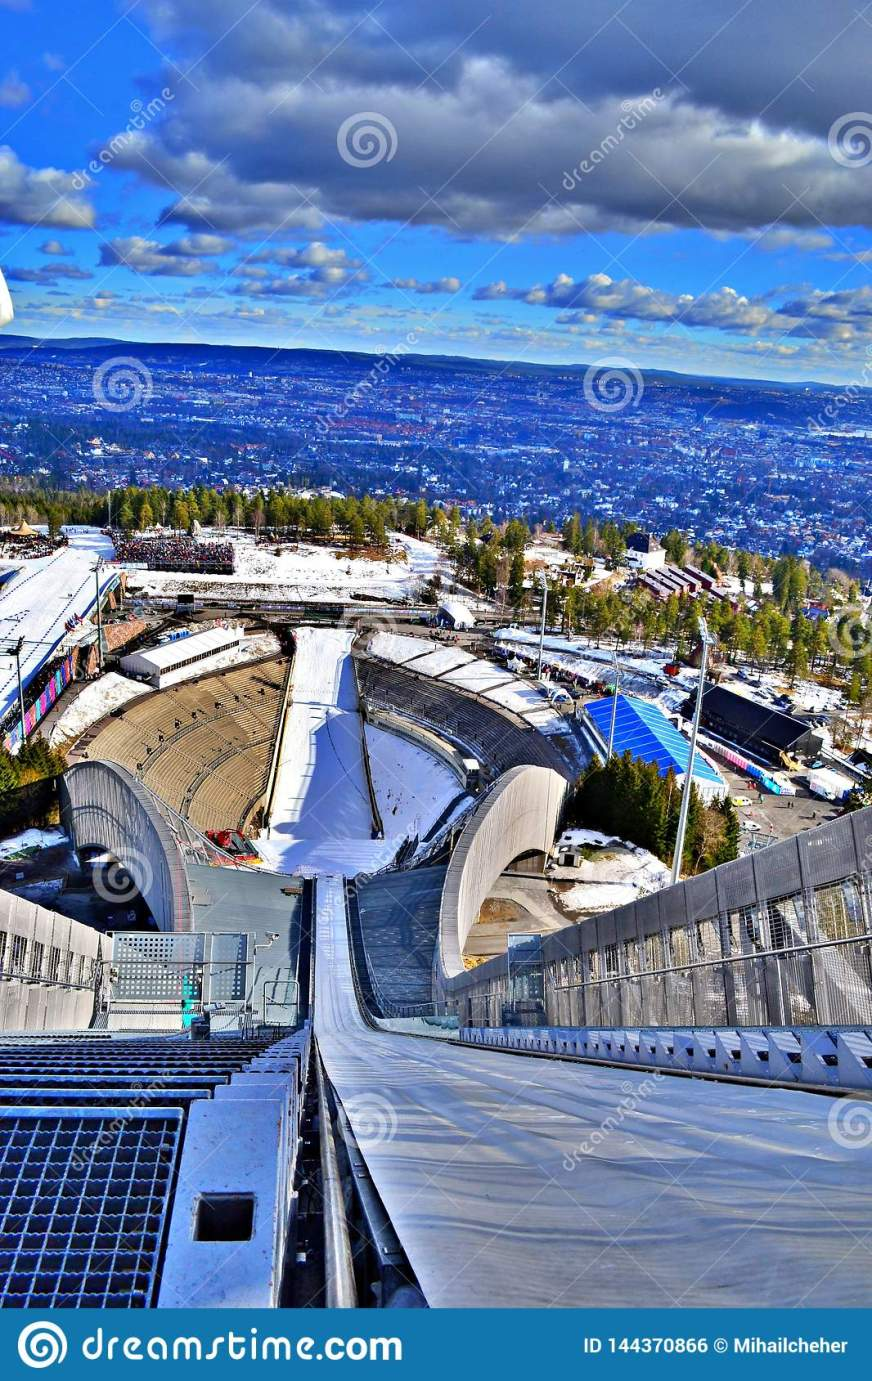 Ski Jumping Arena In Oslo Norway - Spring 2017 Stock Photo ...